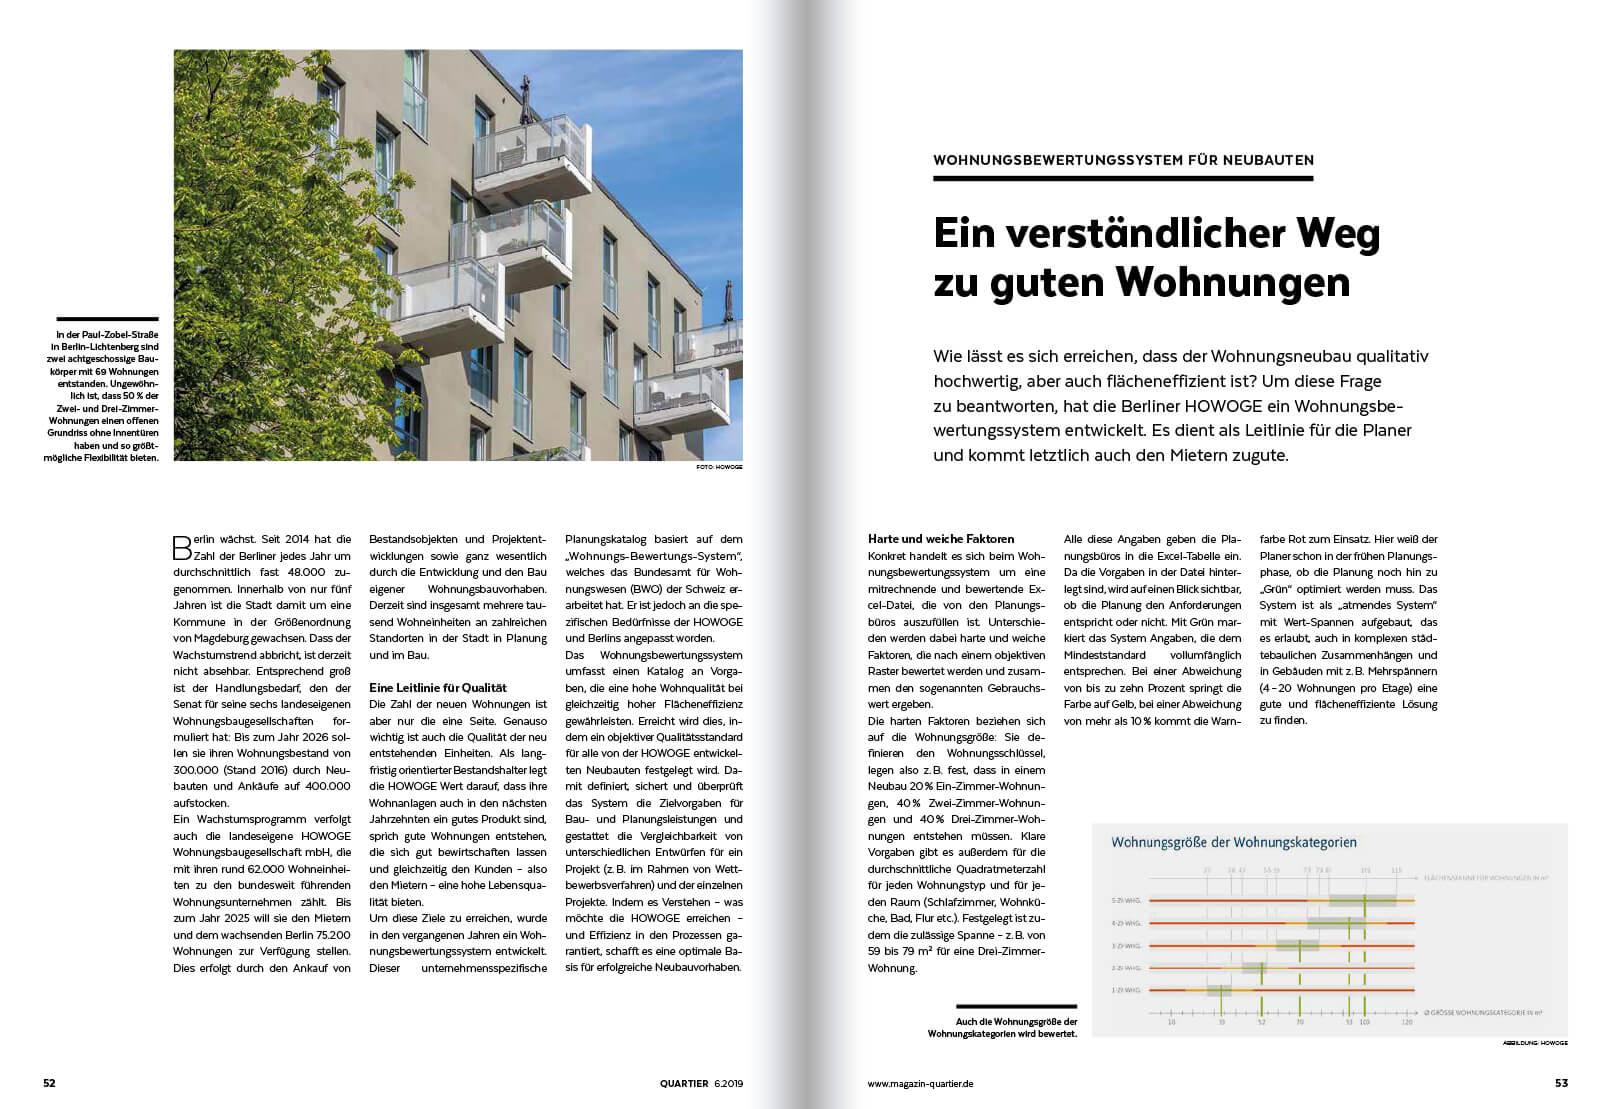 2020-02 Wohnungsbewertungssystem 1